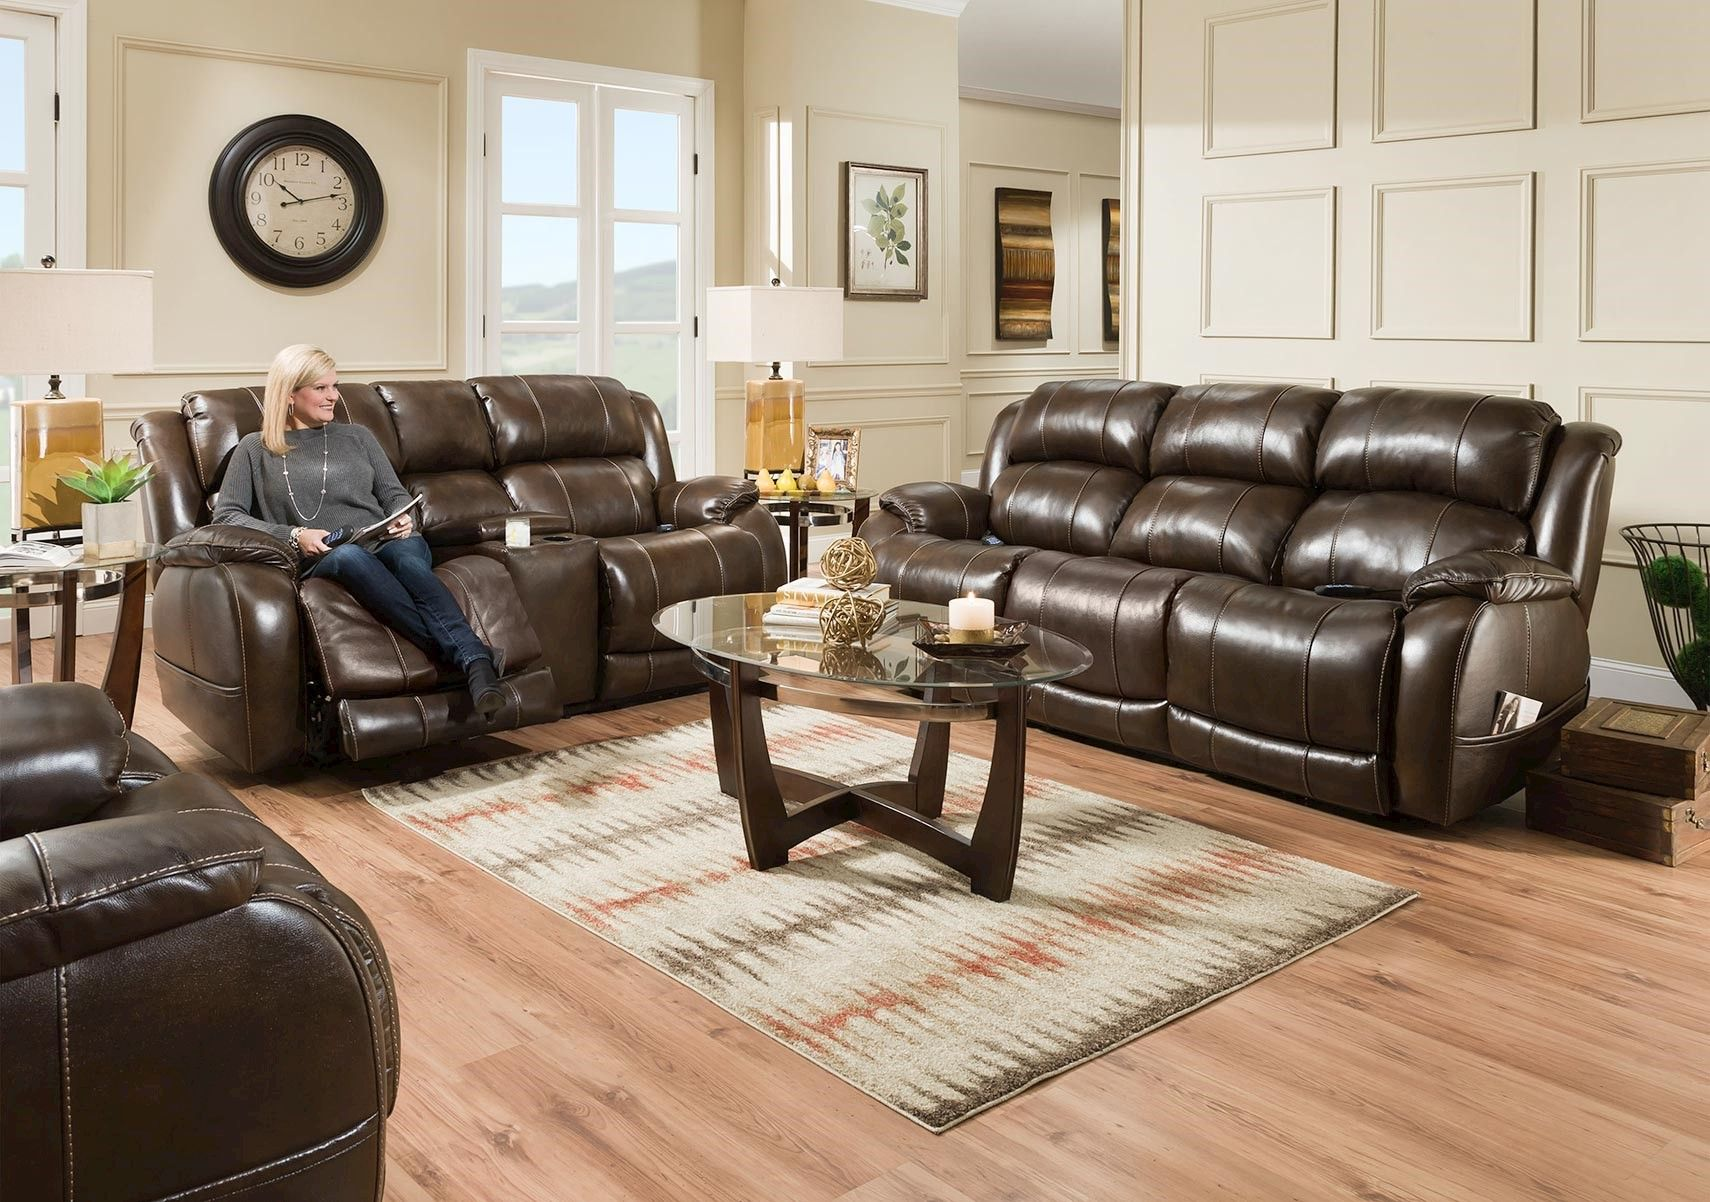 Lacks Palmer 2 Pc Power Reclining Living Room Set Living Room